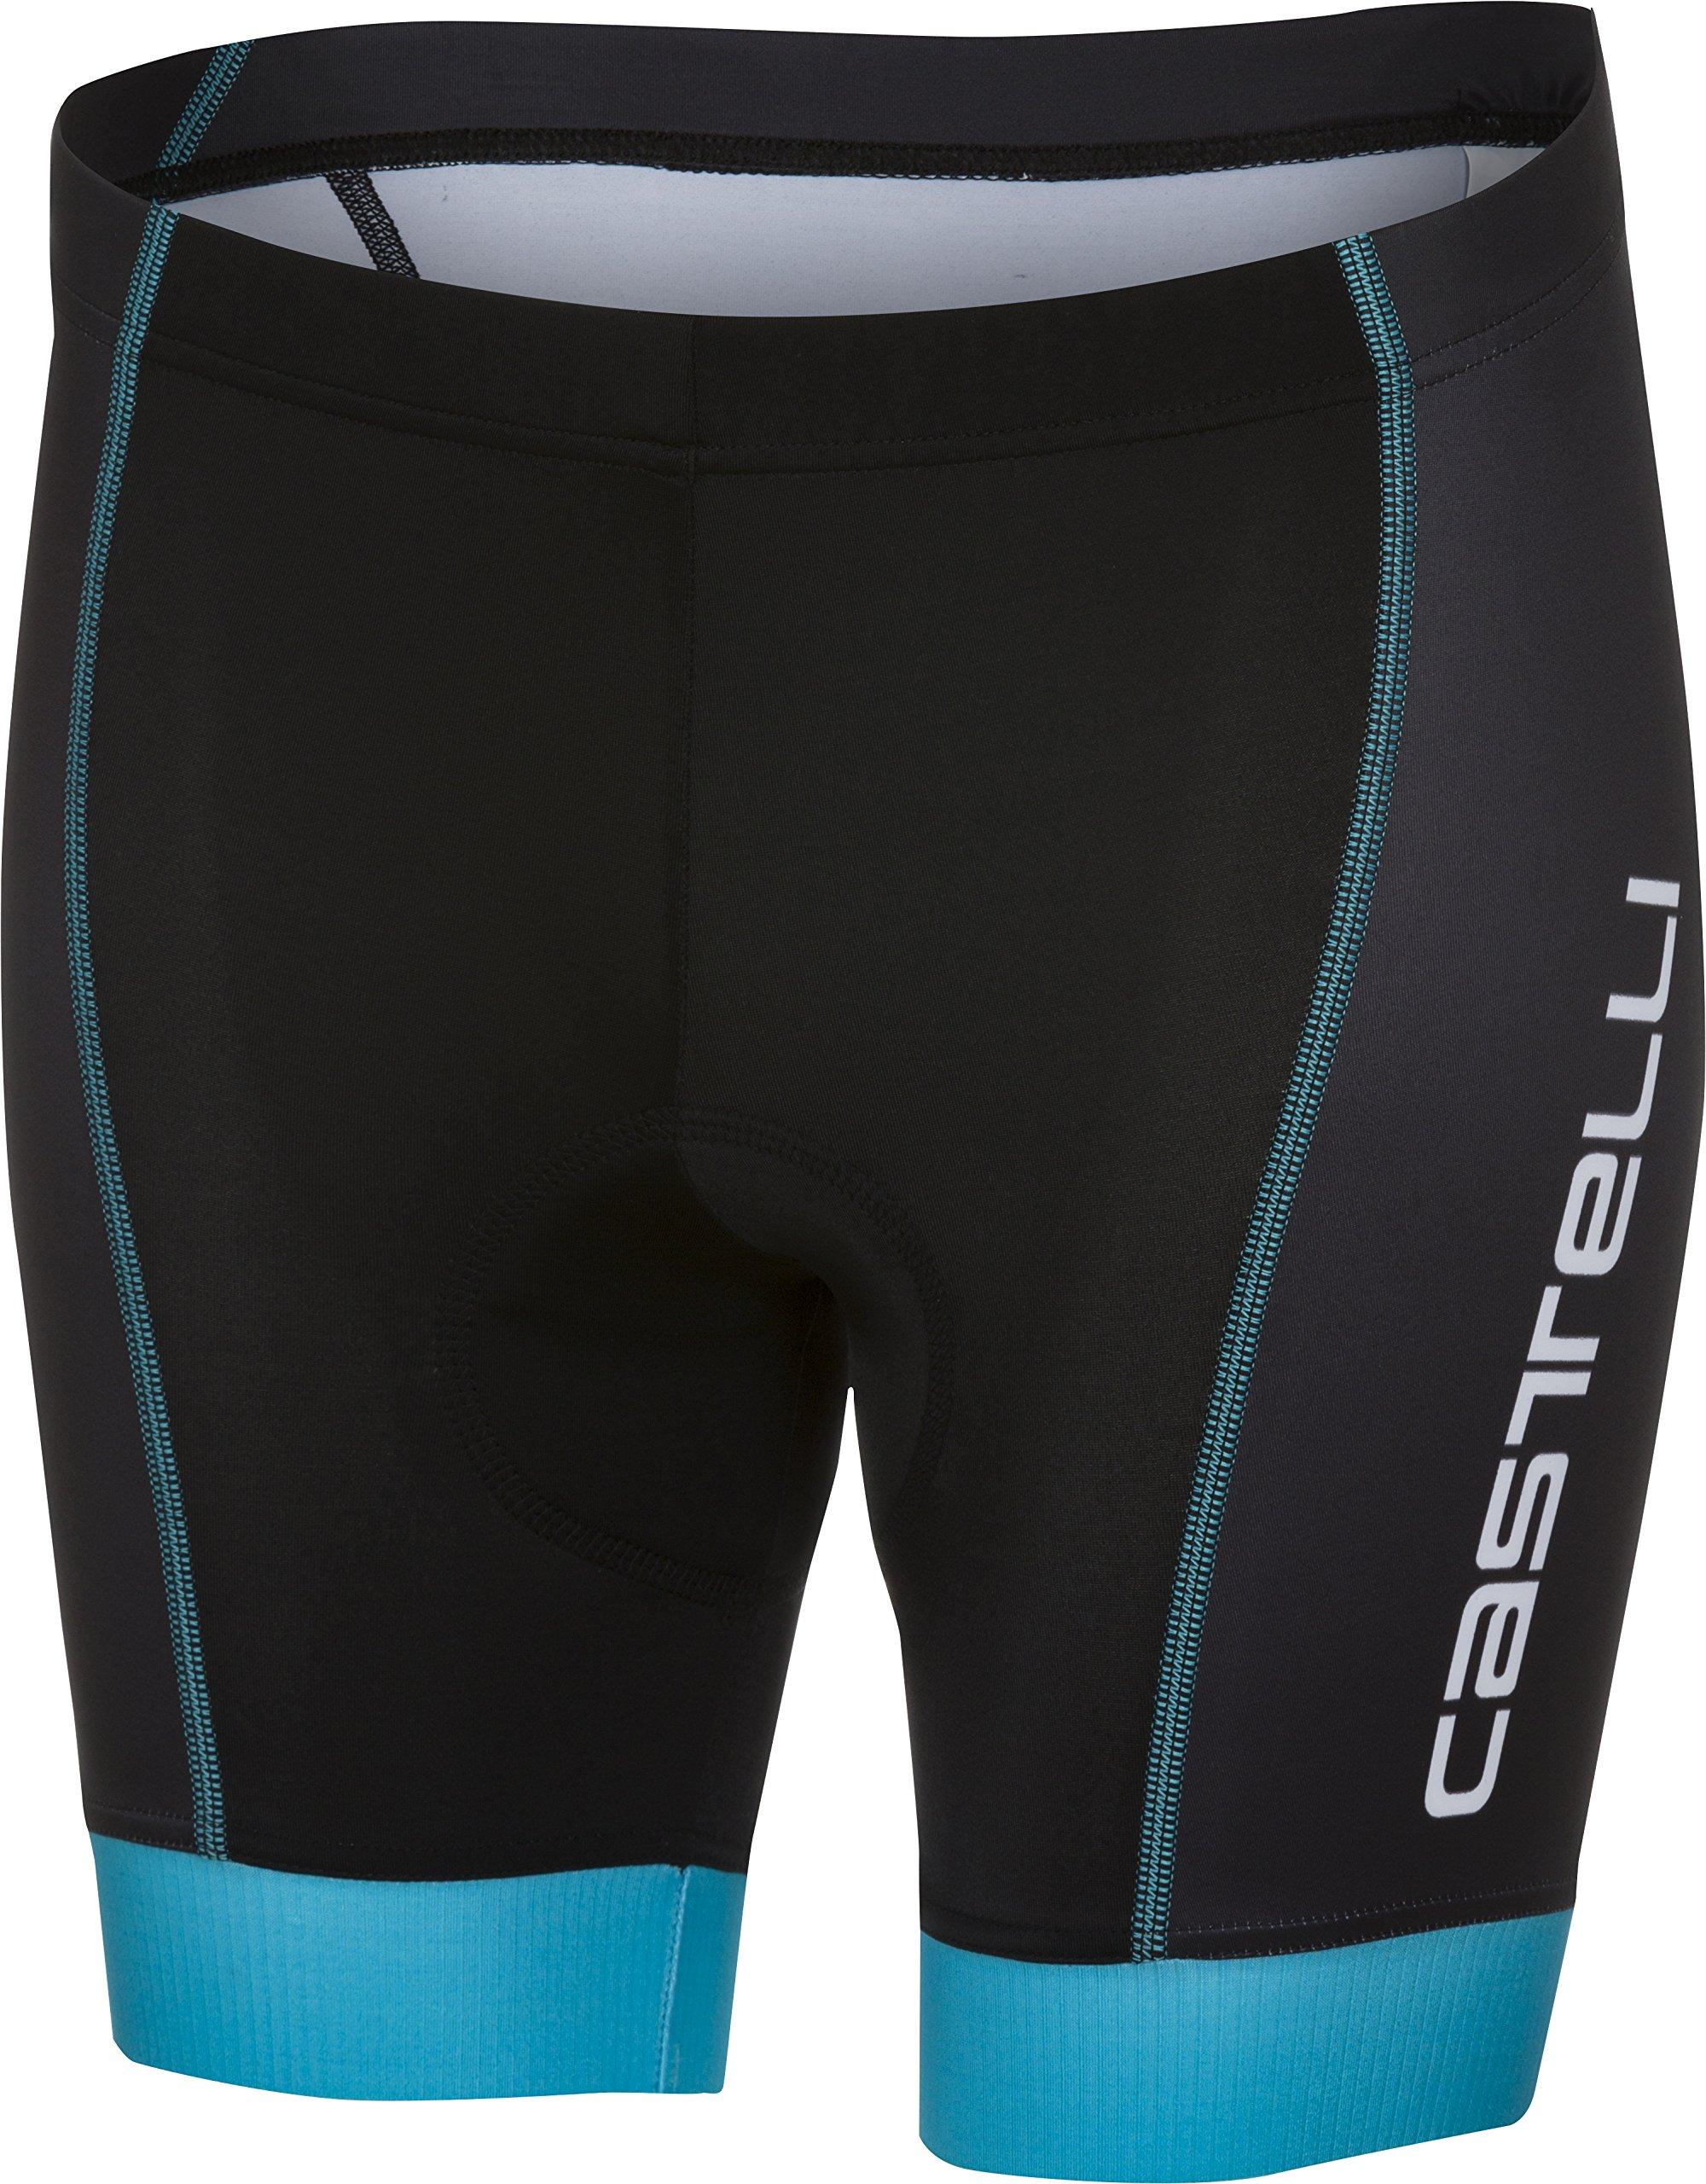 Castelli Future Racer Kid Short - Boys' Black/Sky Blue, 8